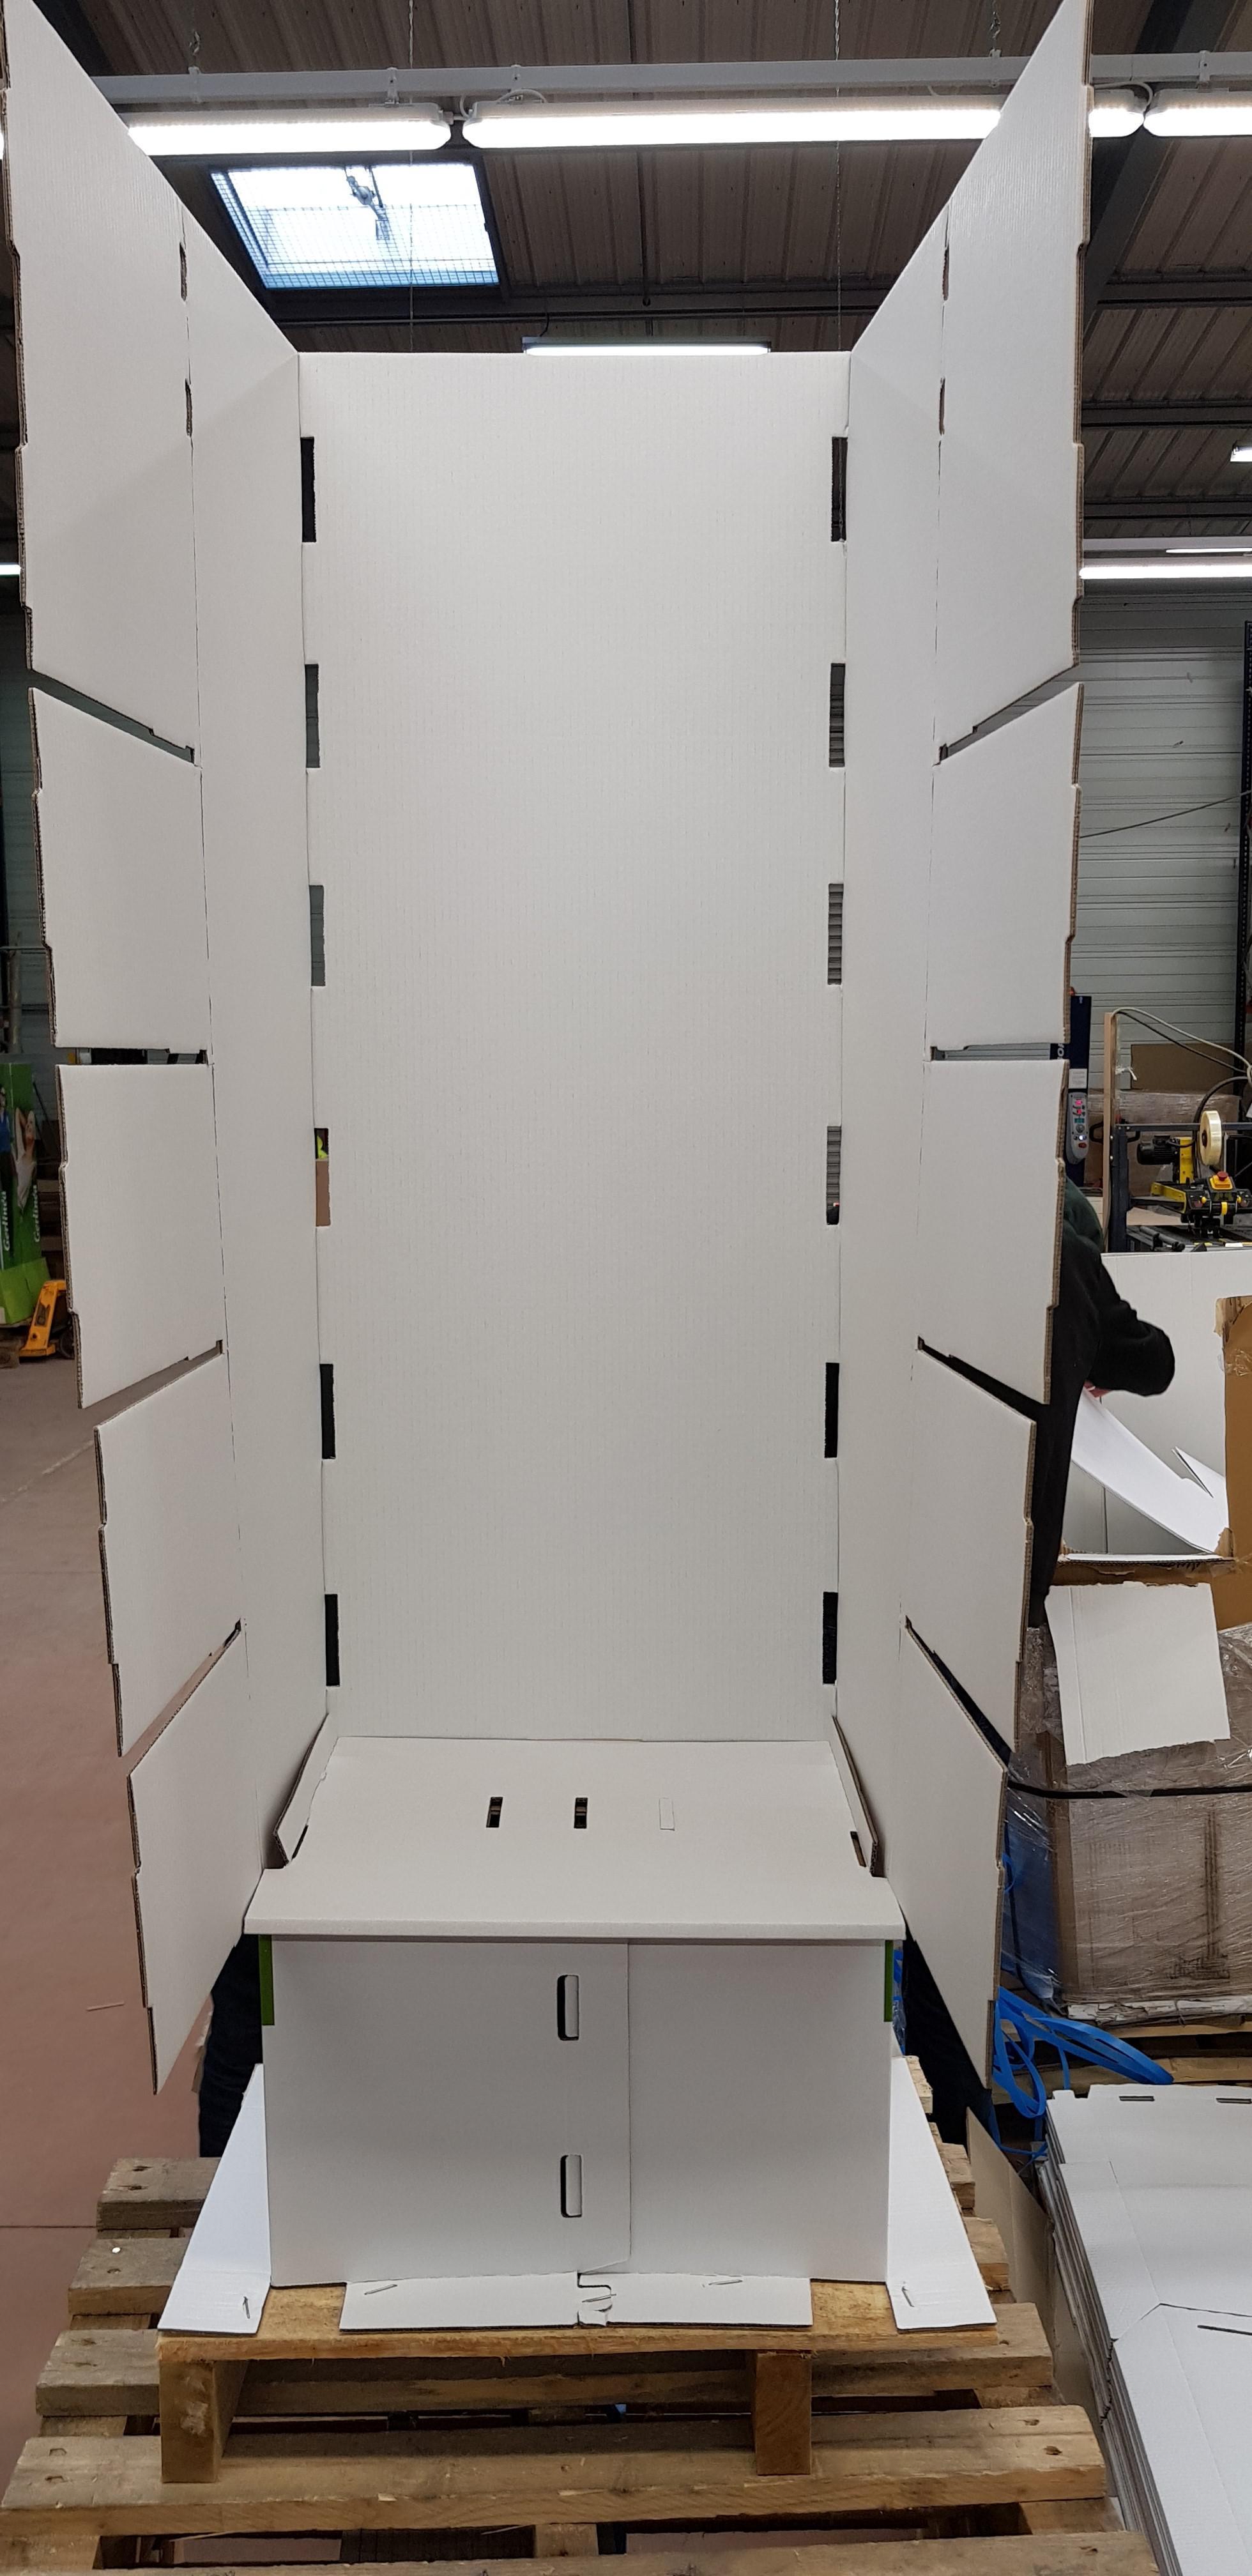 box5-ConvertImage